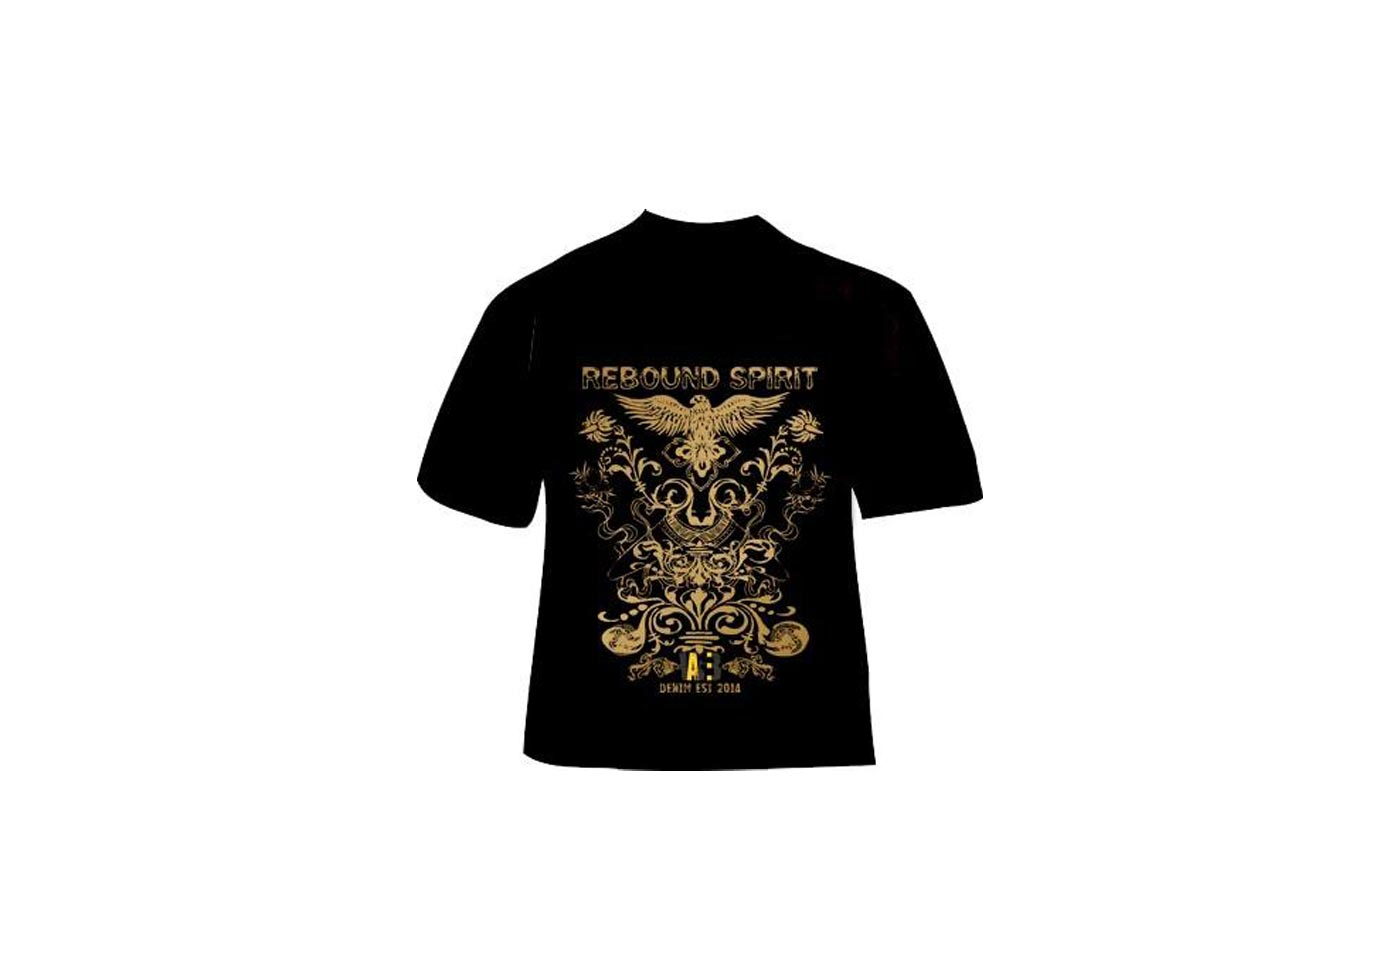 T shirt vector design free vector art at vecteezy for Vector art for t shirts